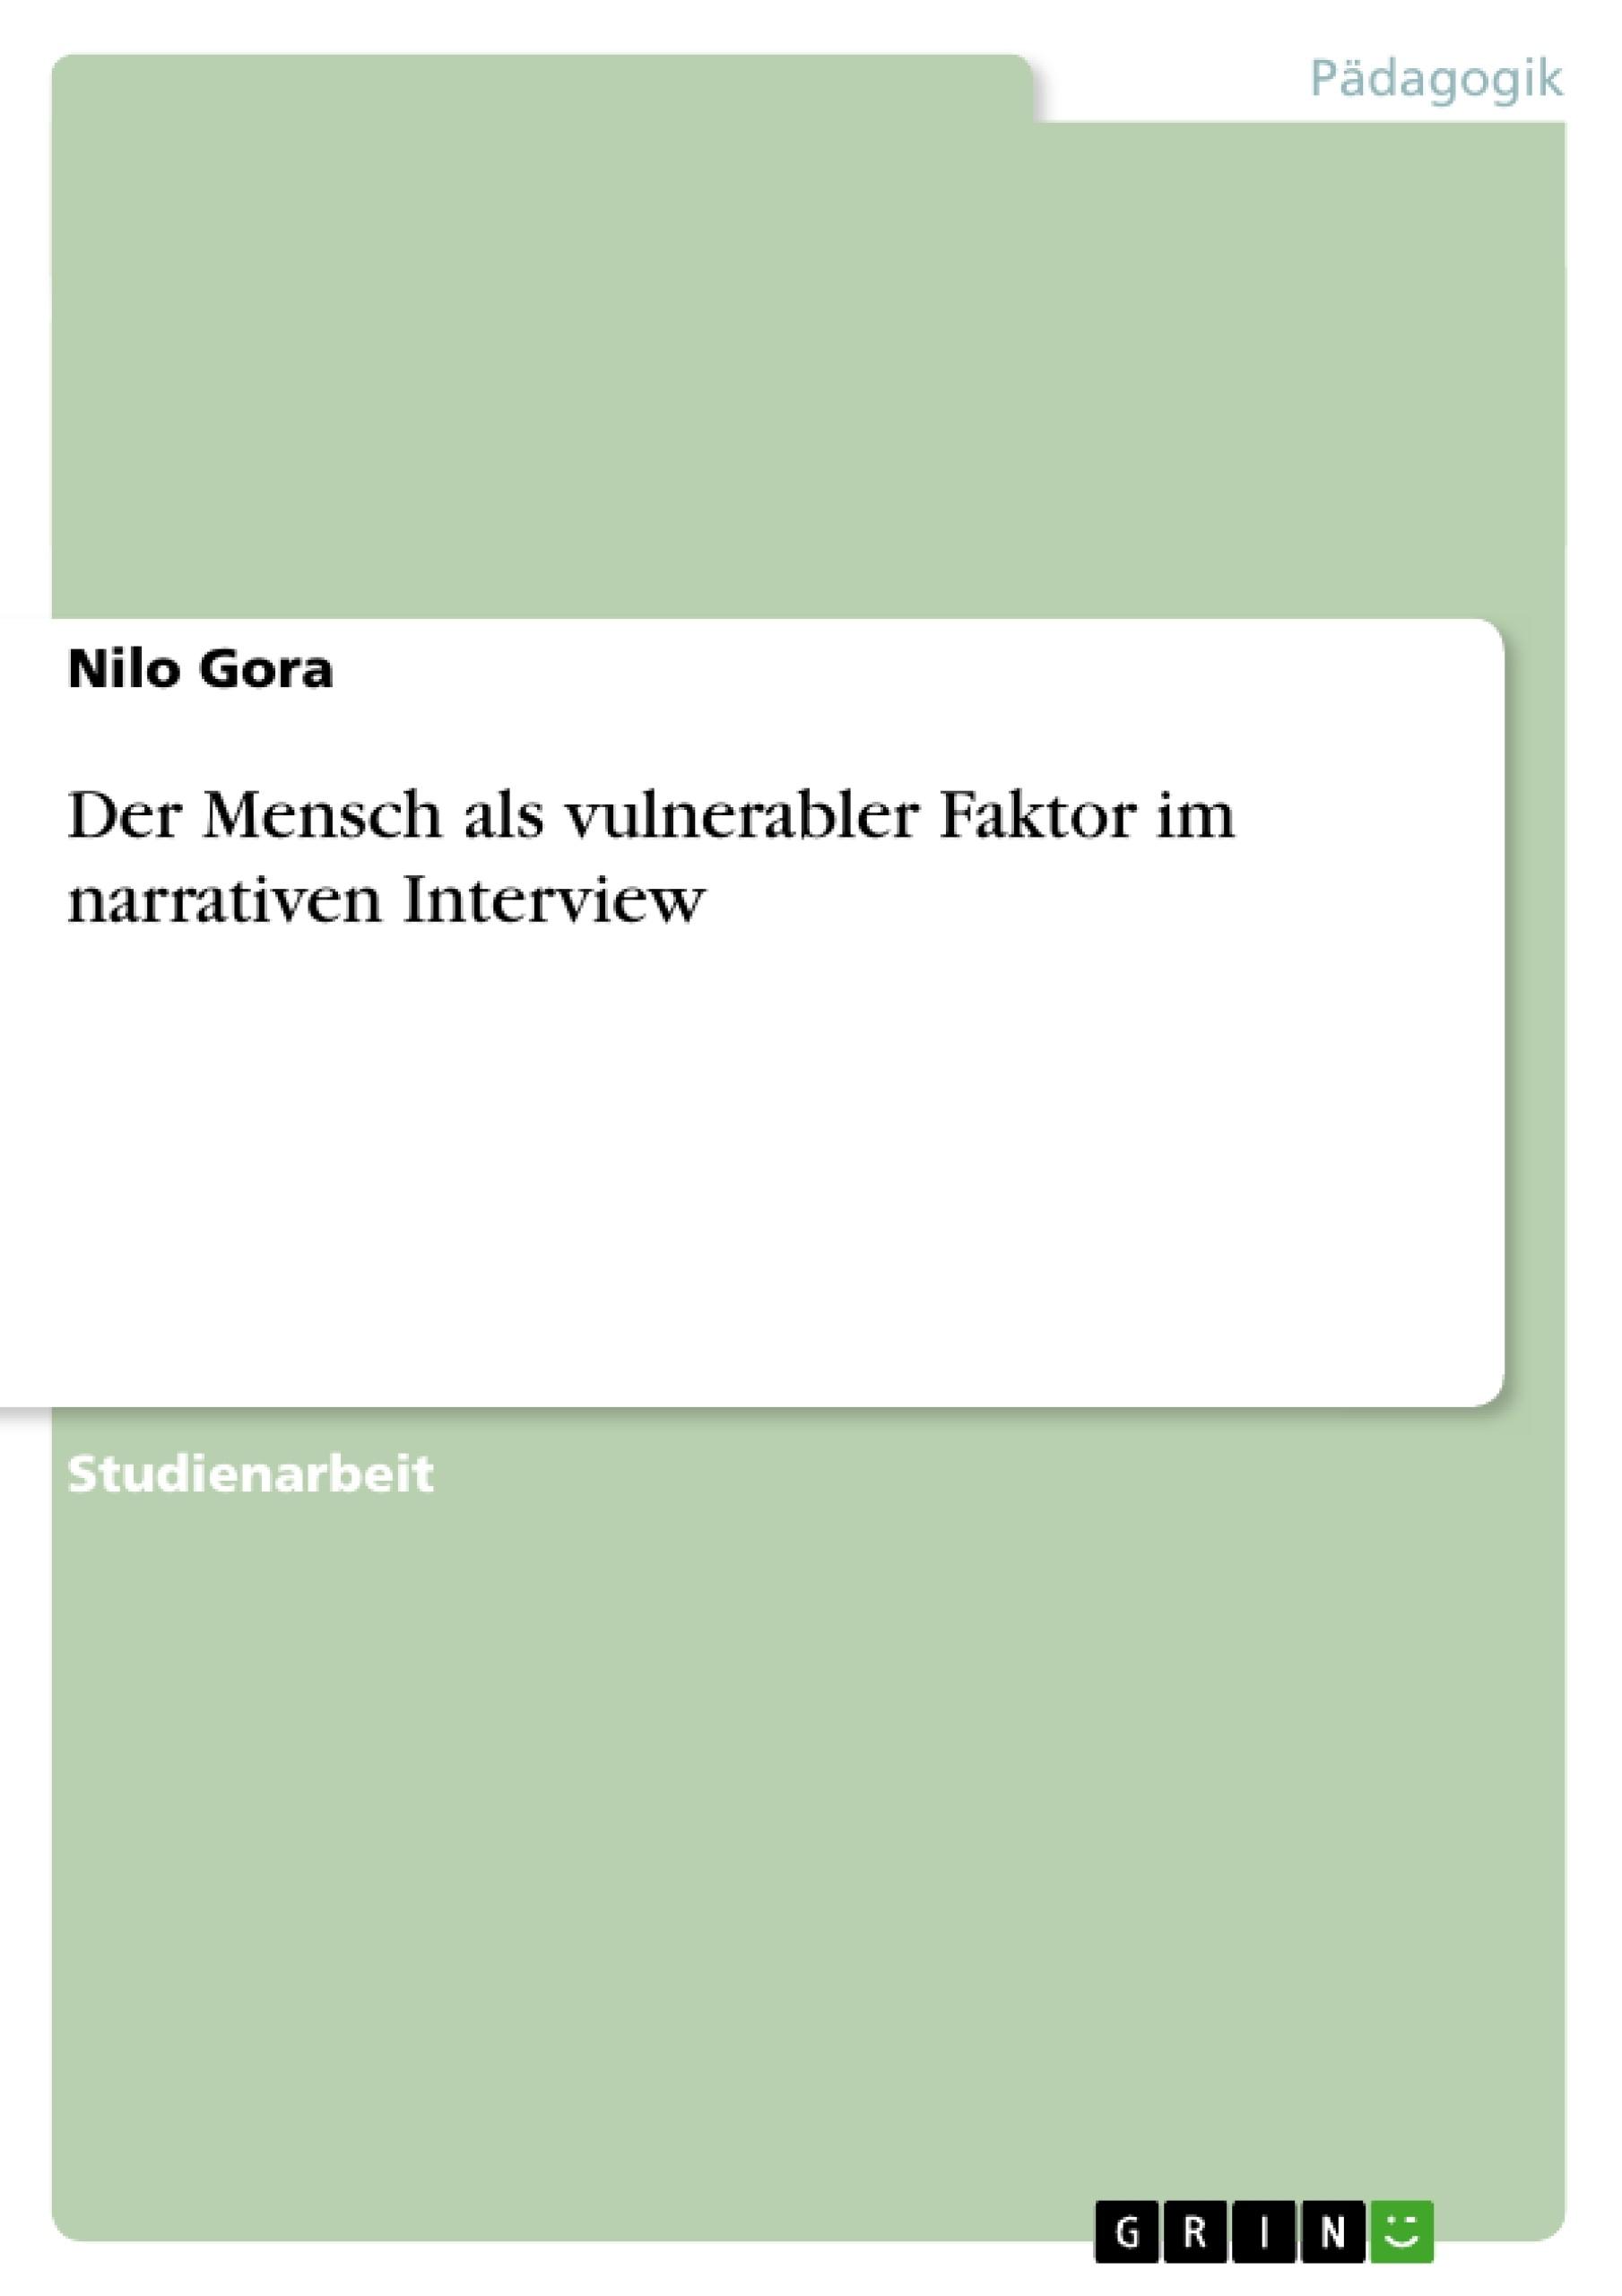 Titel: Der Mensch als vulnerabler Faktor im narrativen Interview